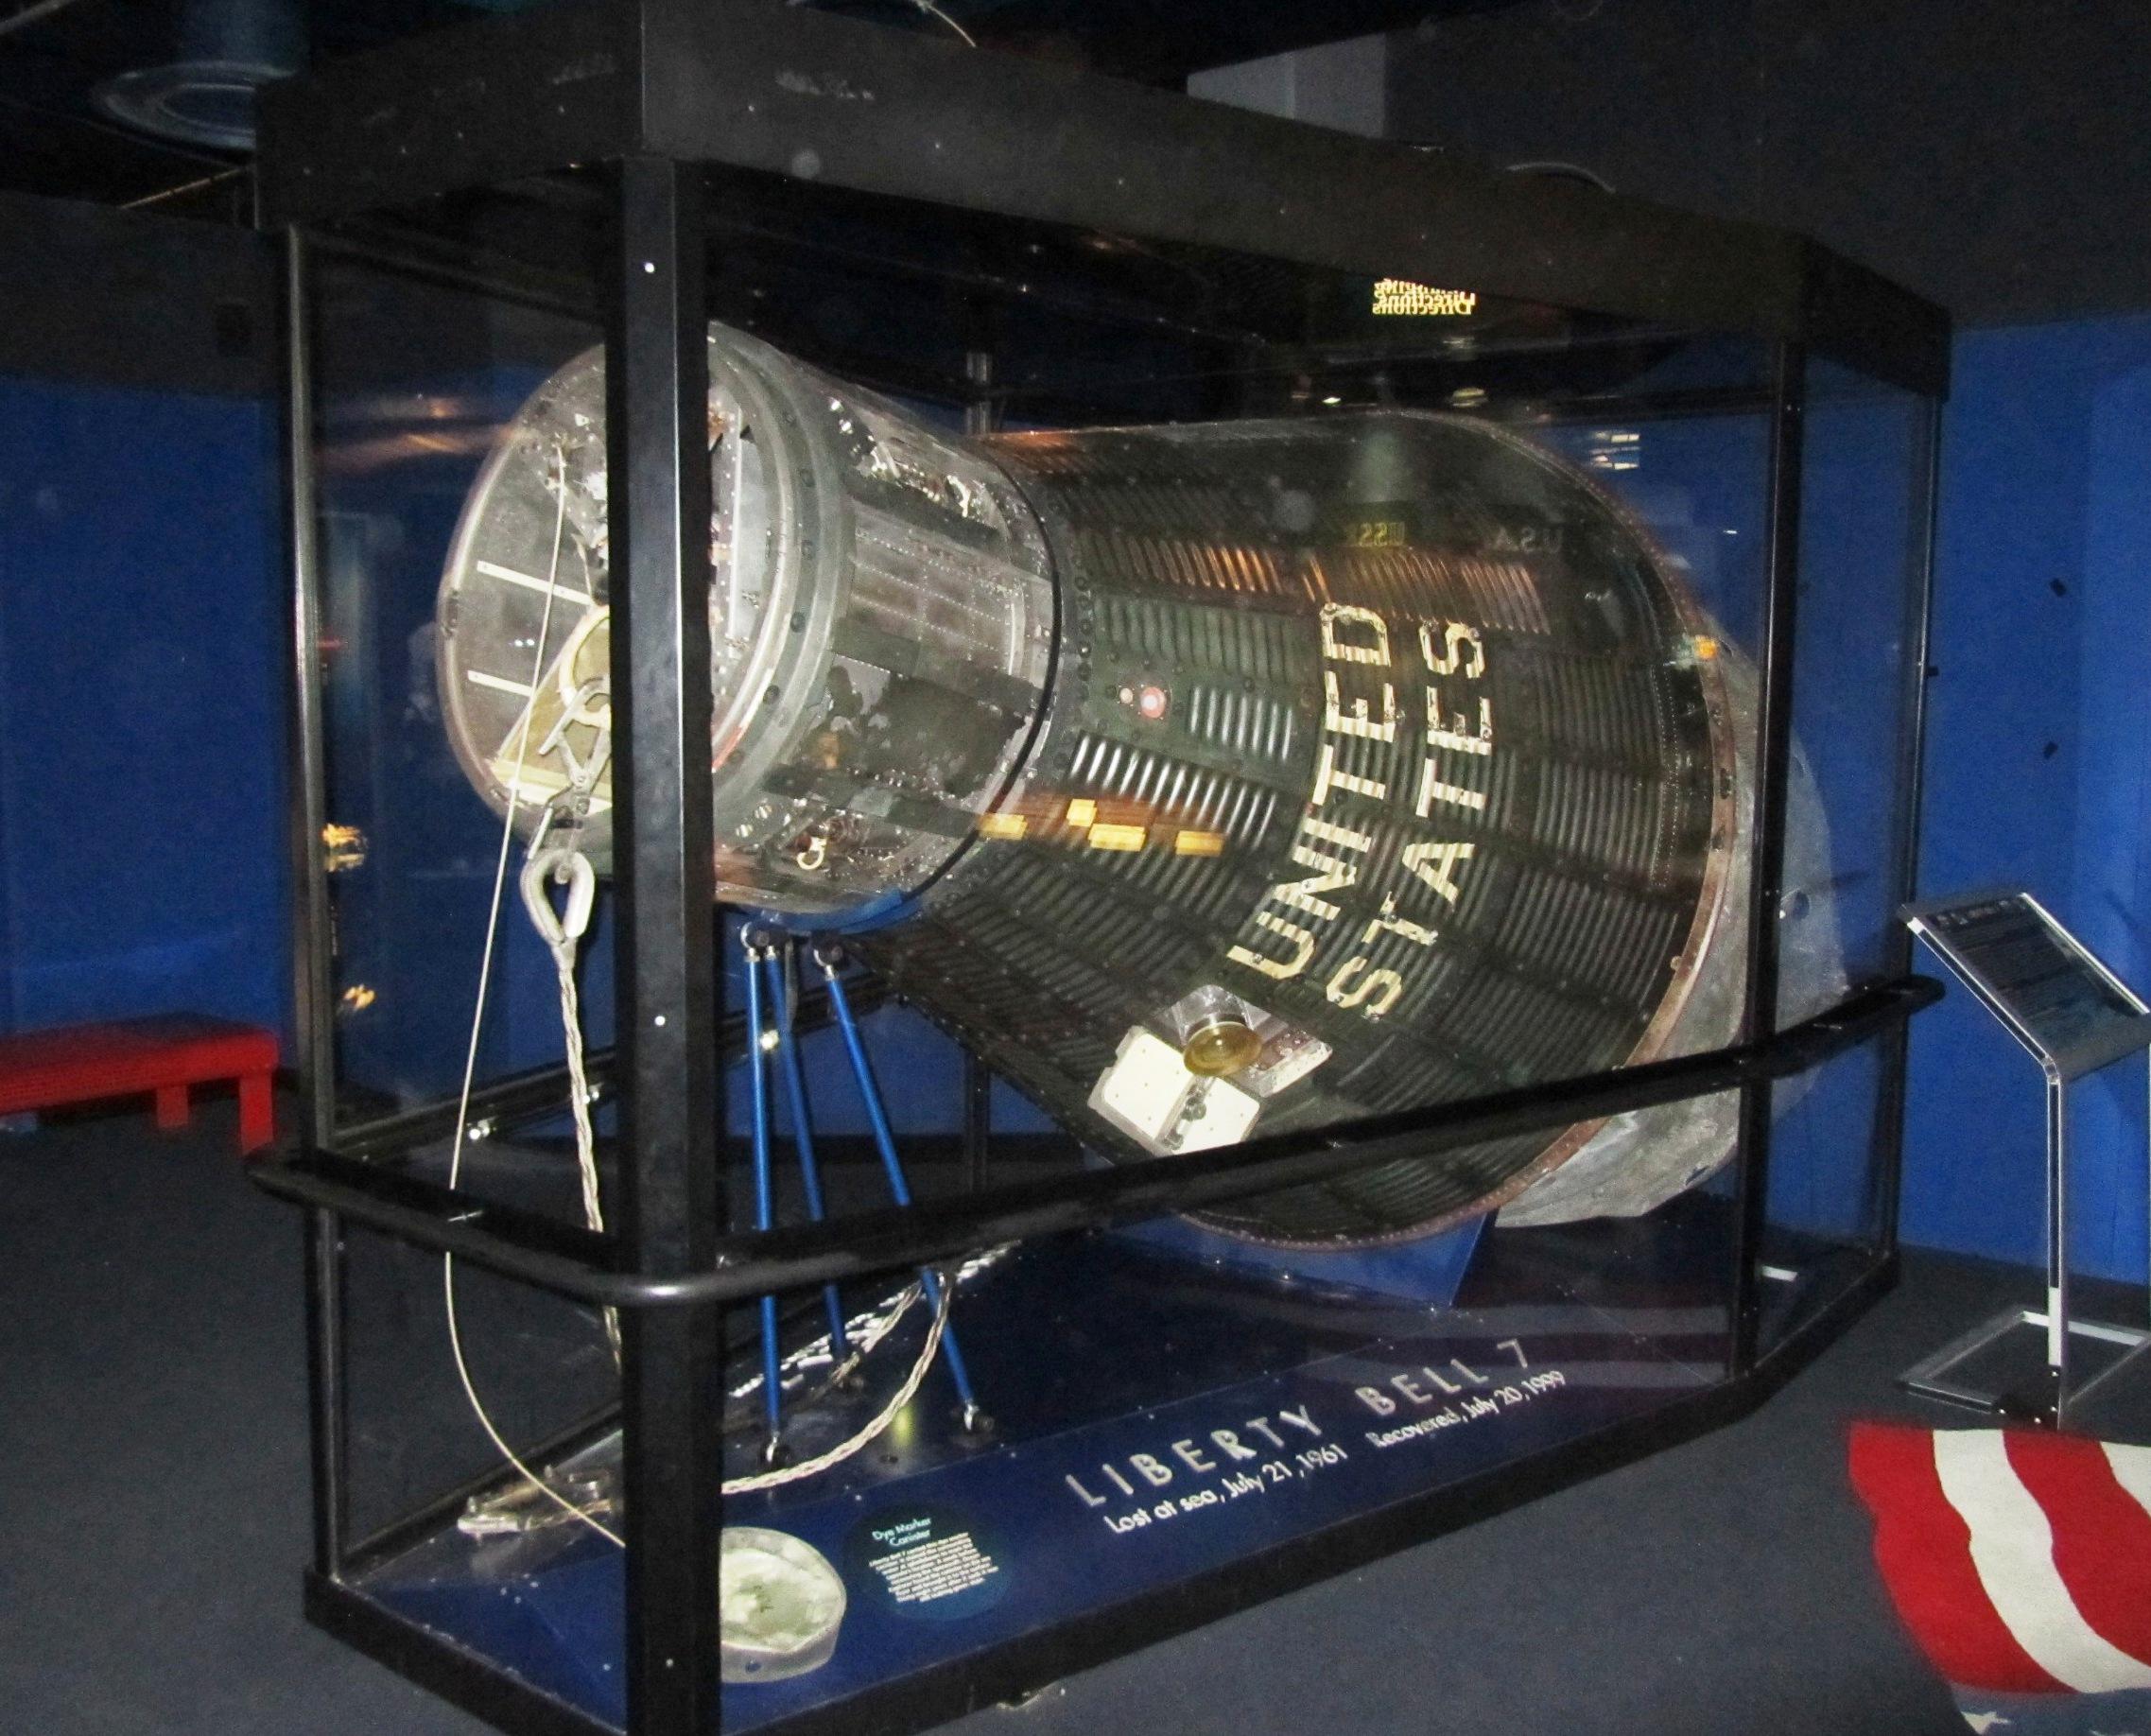 liberty bell 7 spacecraft model - photo #7